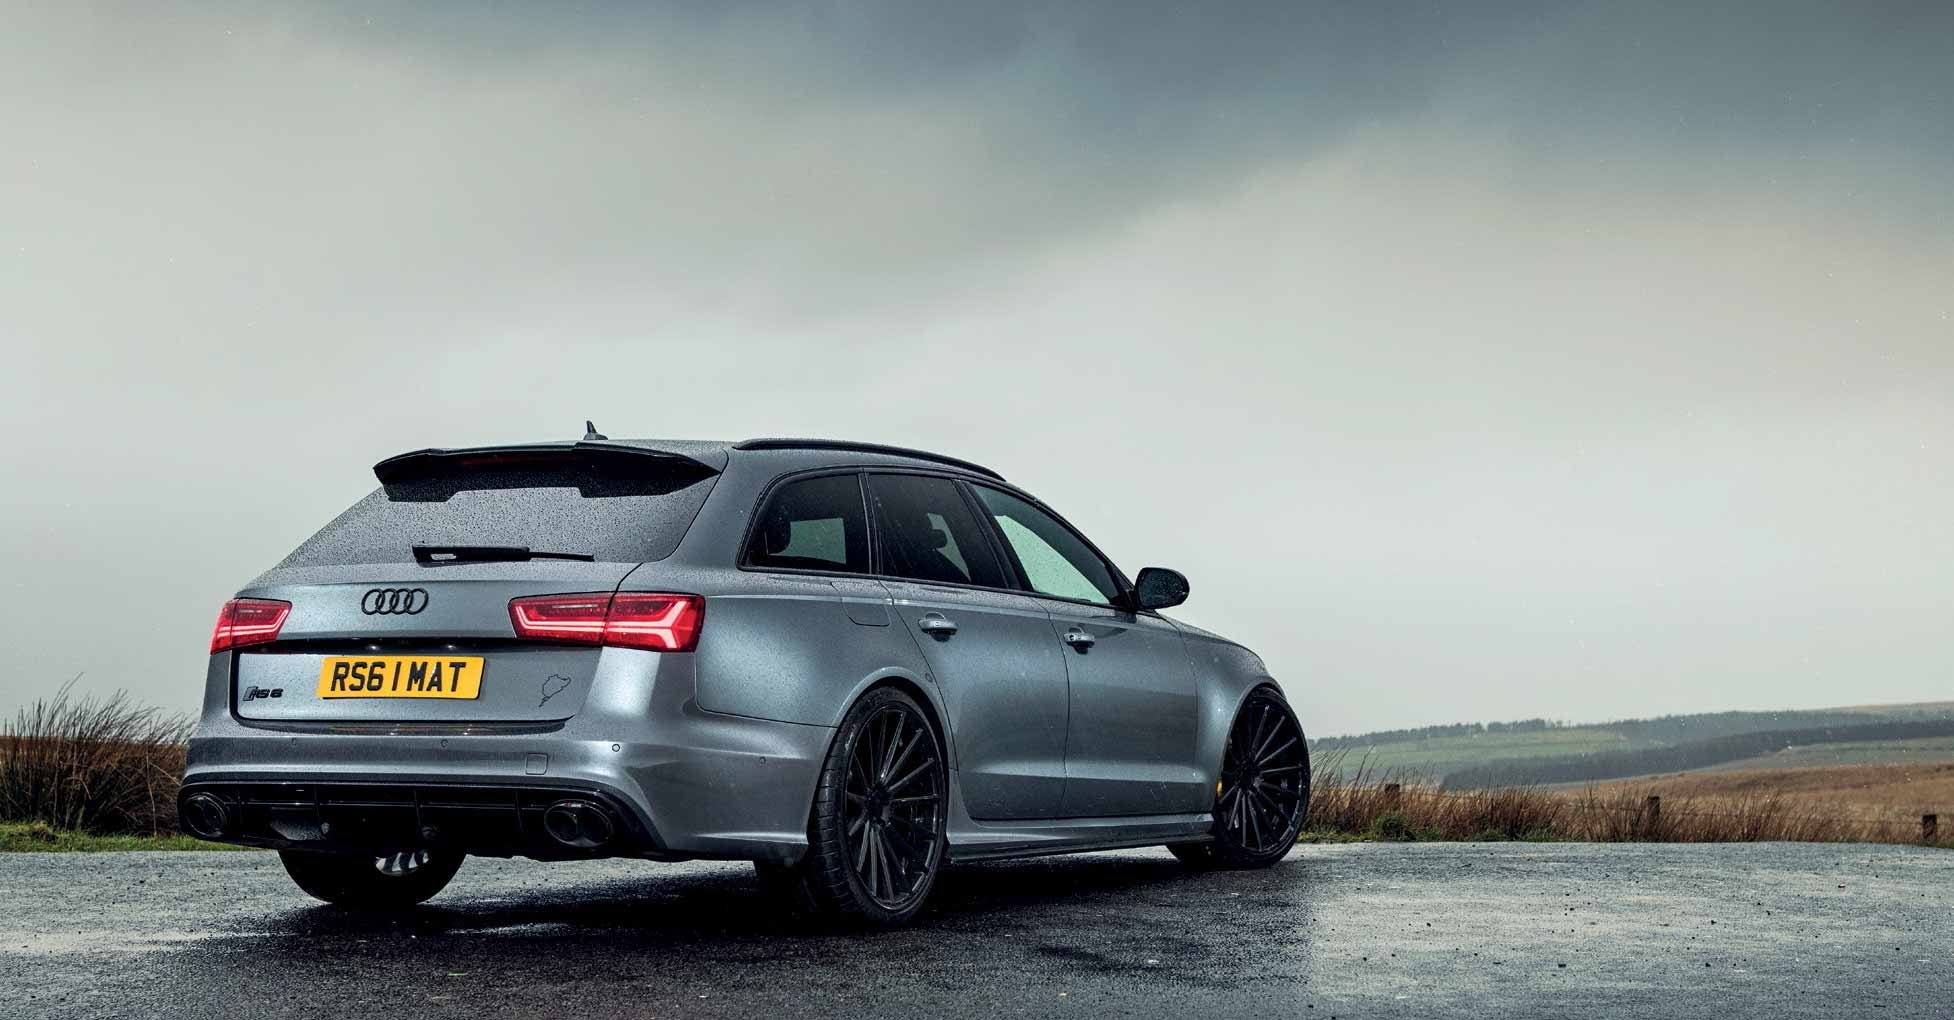 2017 Audi RS6 Avant Performance C7 700bhp REVO Stage 1 tune